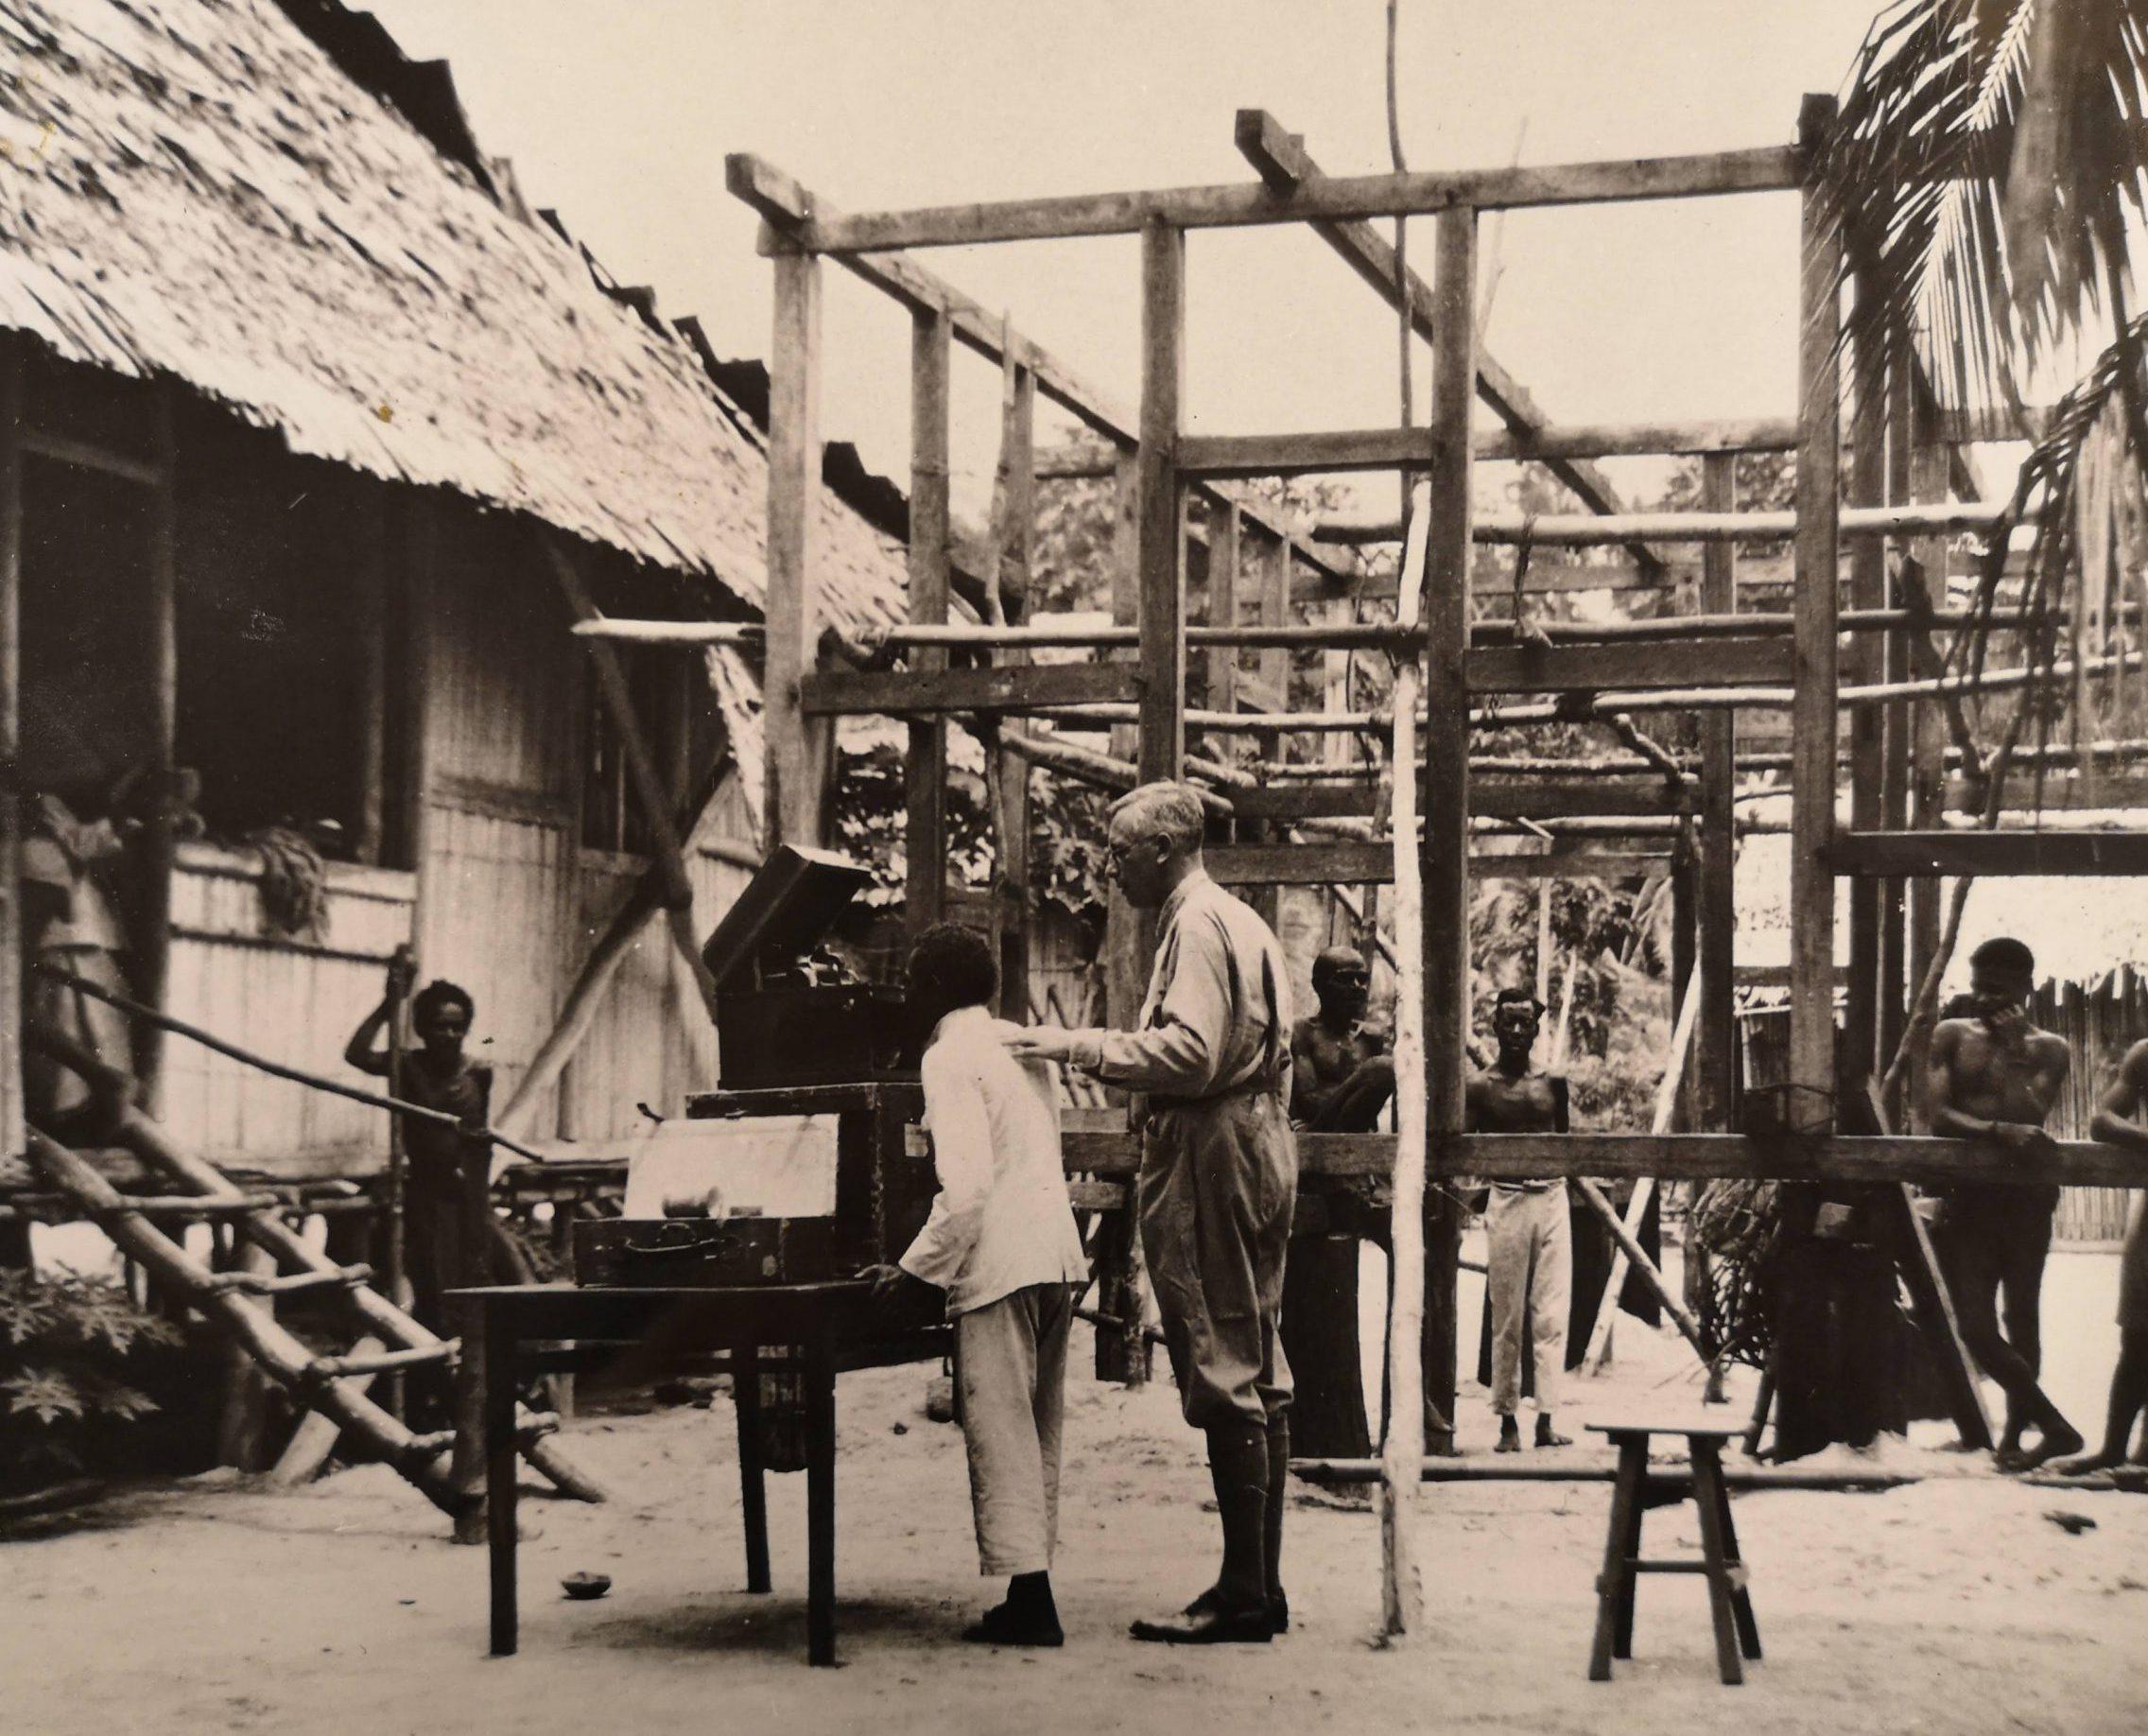 Recording Session at Urbinasopèn, Waigéo (1932) - Jaap Kunst Collection, Amsterdam